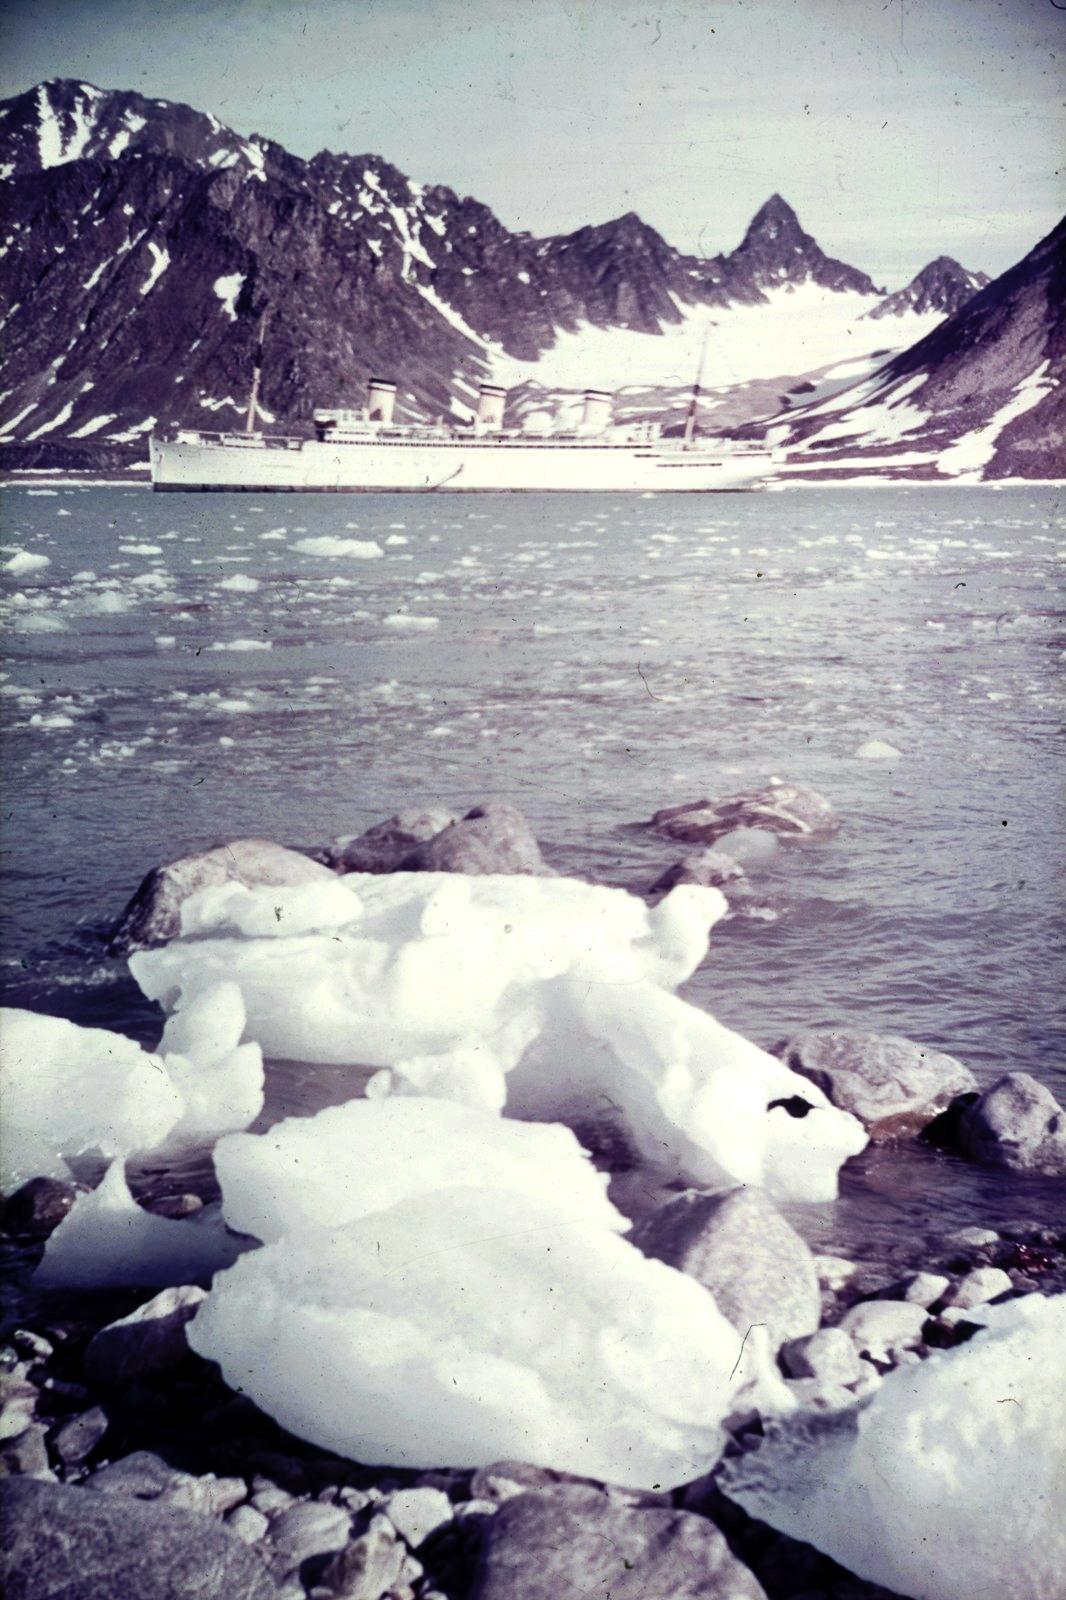 Шпицберген. Бухта Магдалена с пассажирским судном